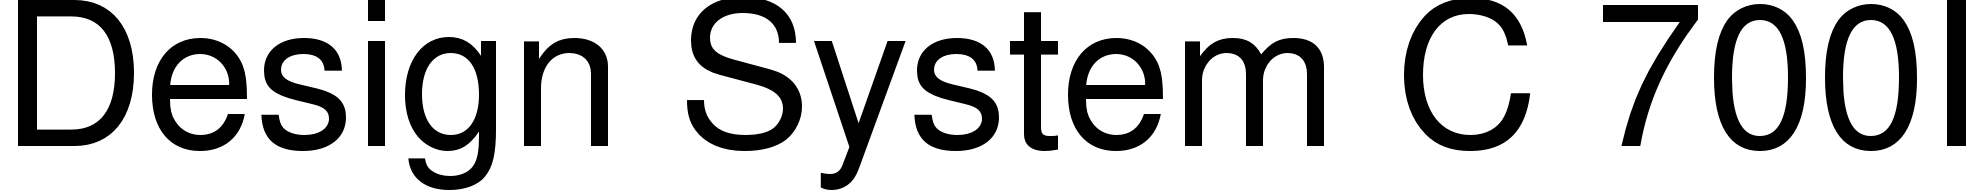 Design System C 700I